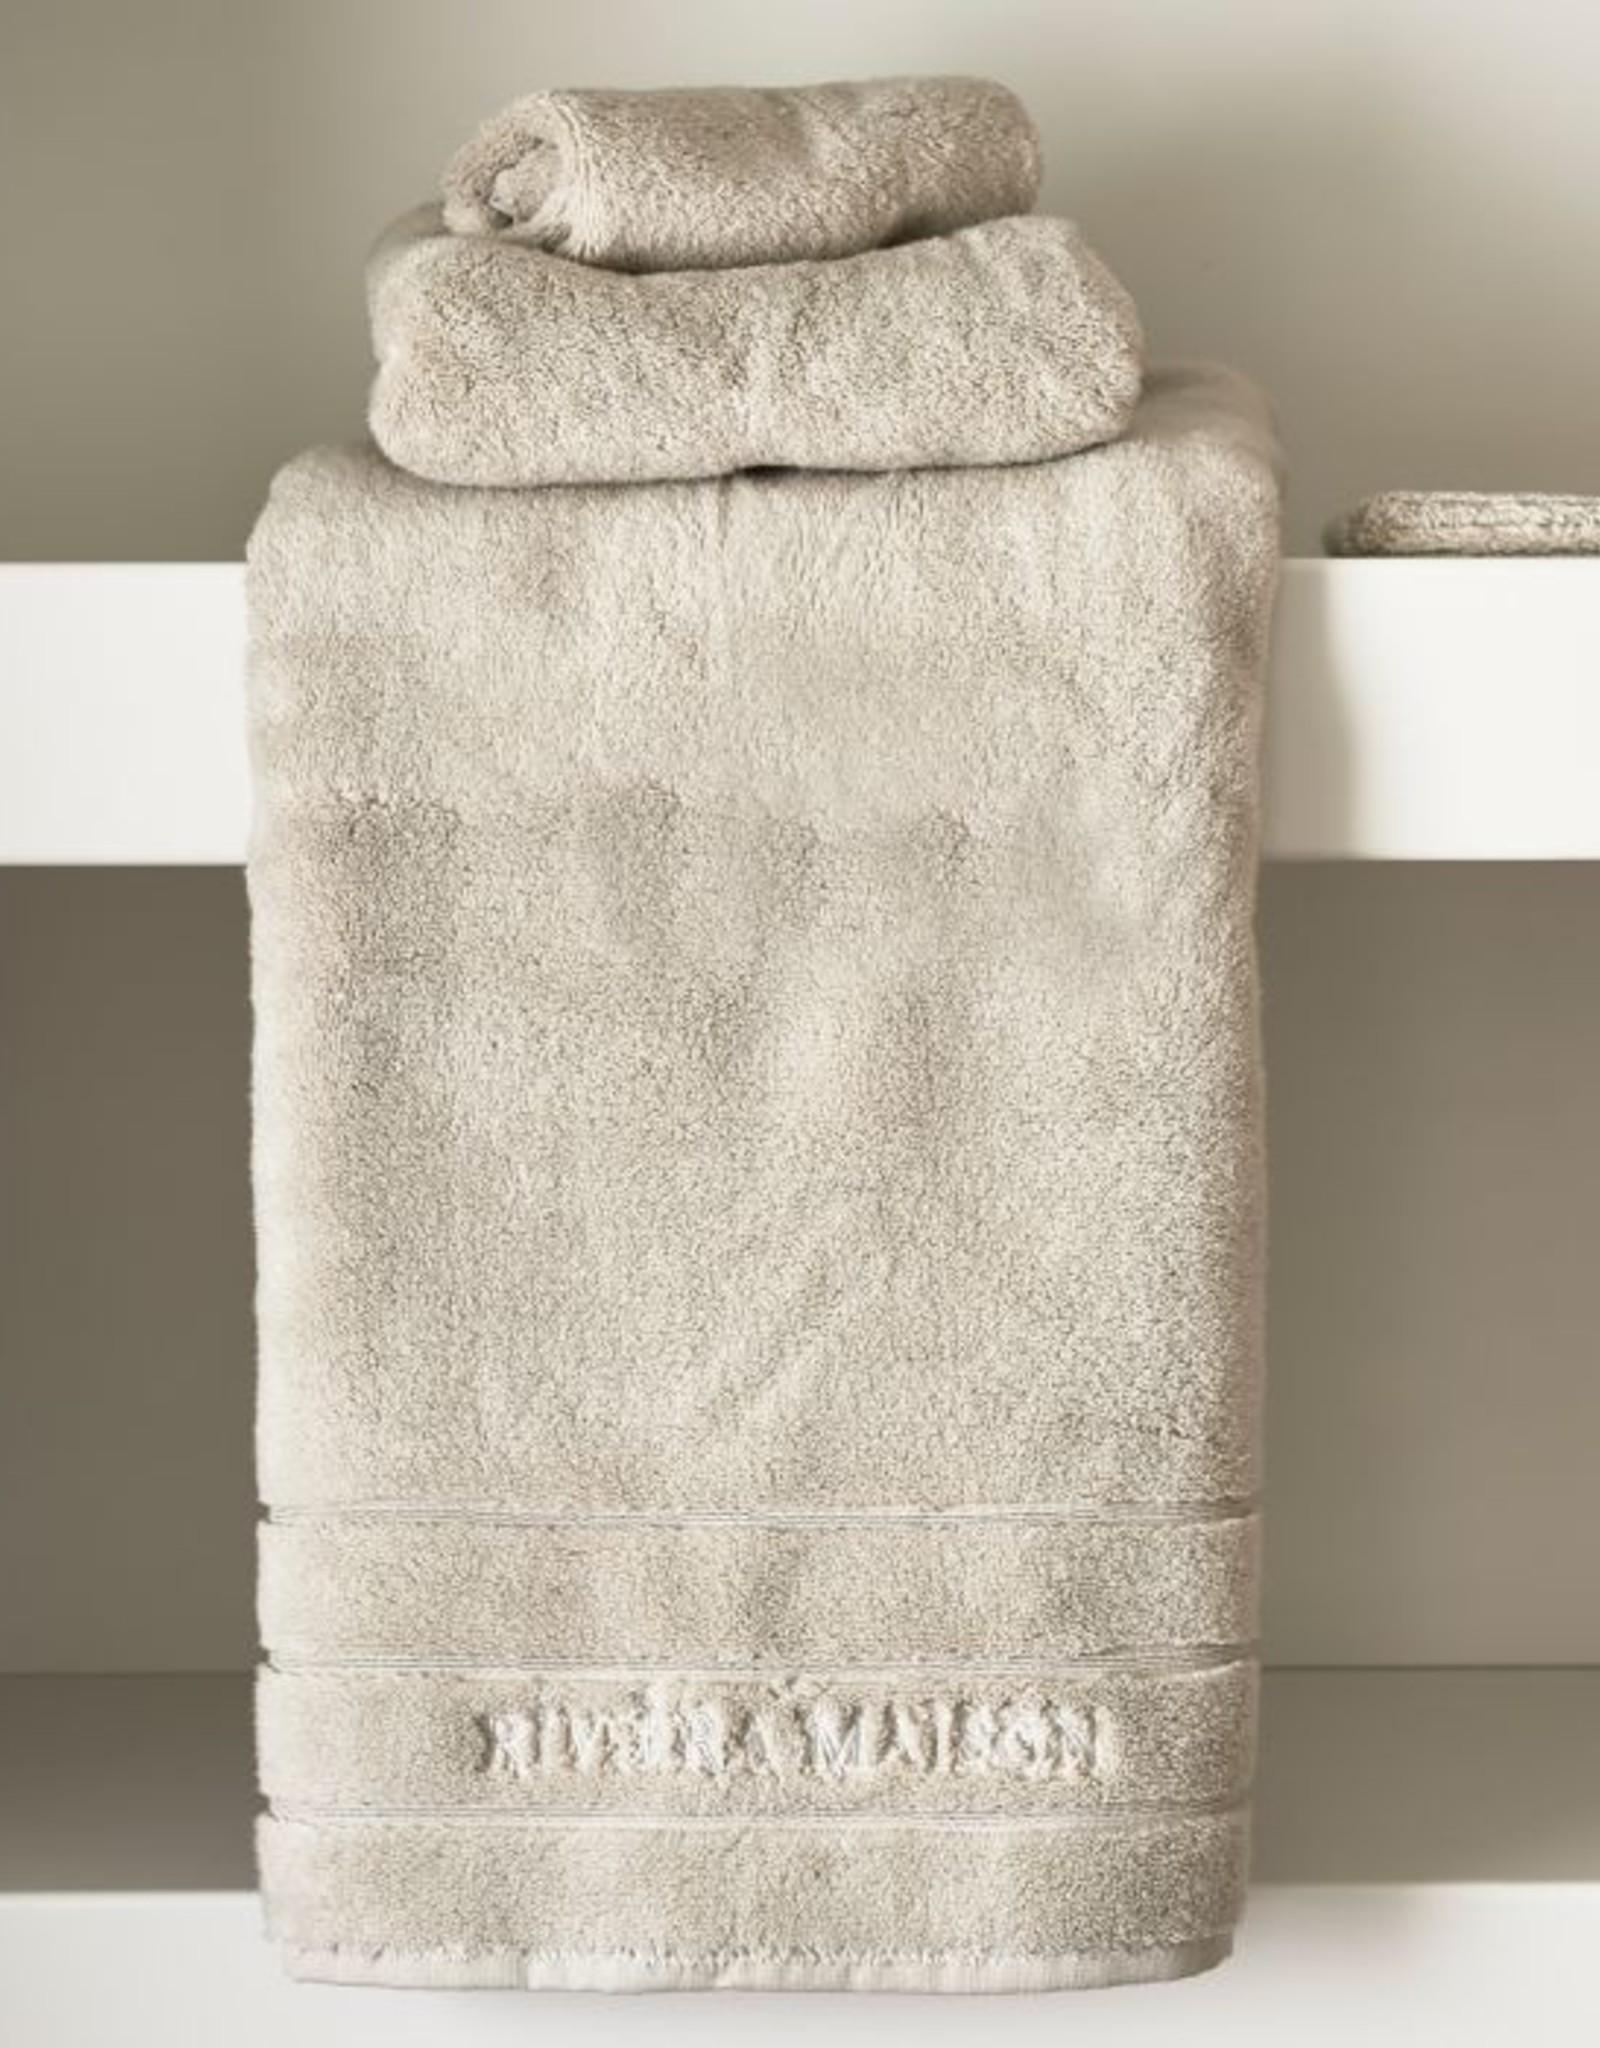 Riviera Maison RM Hotel Towel stone 140x70